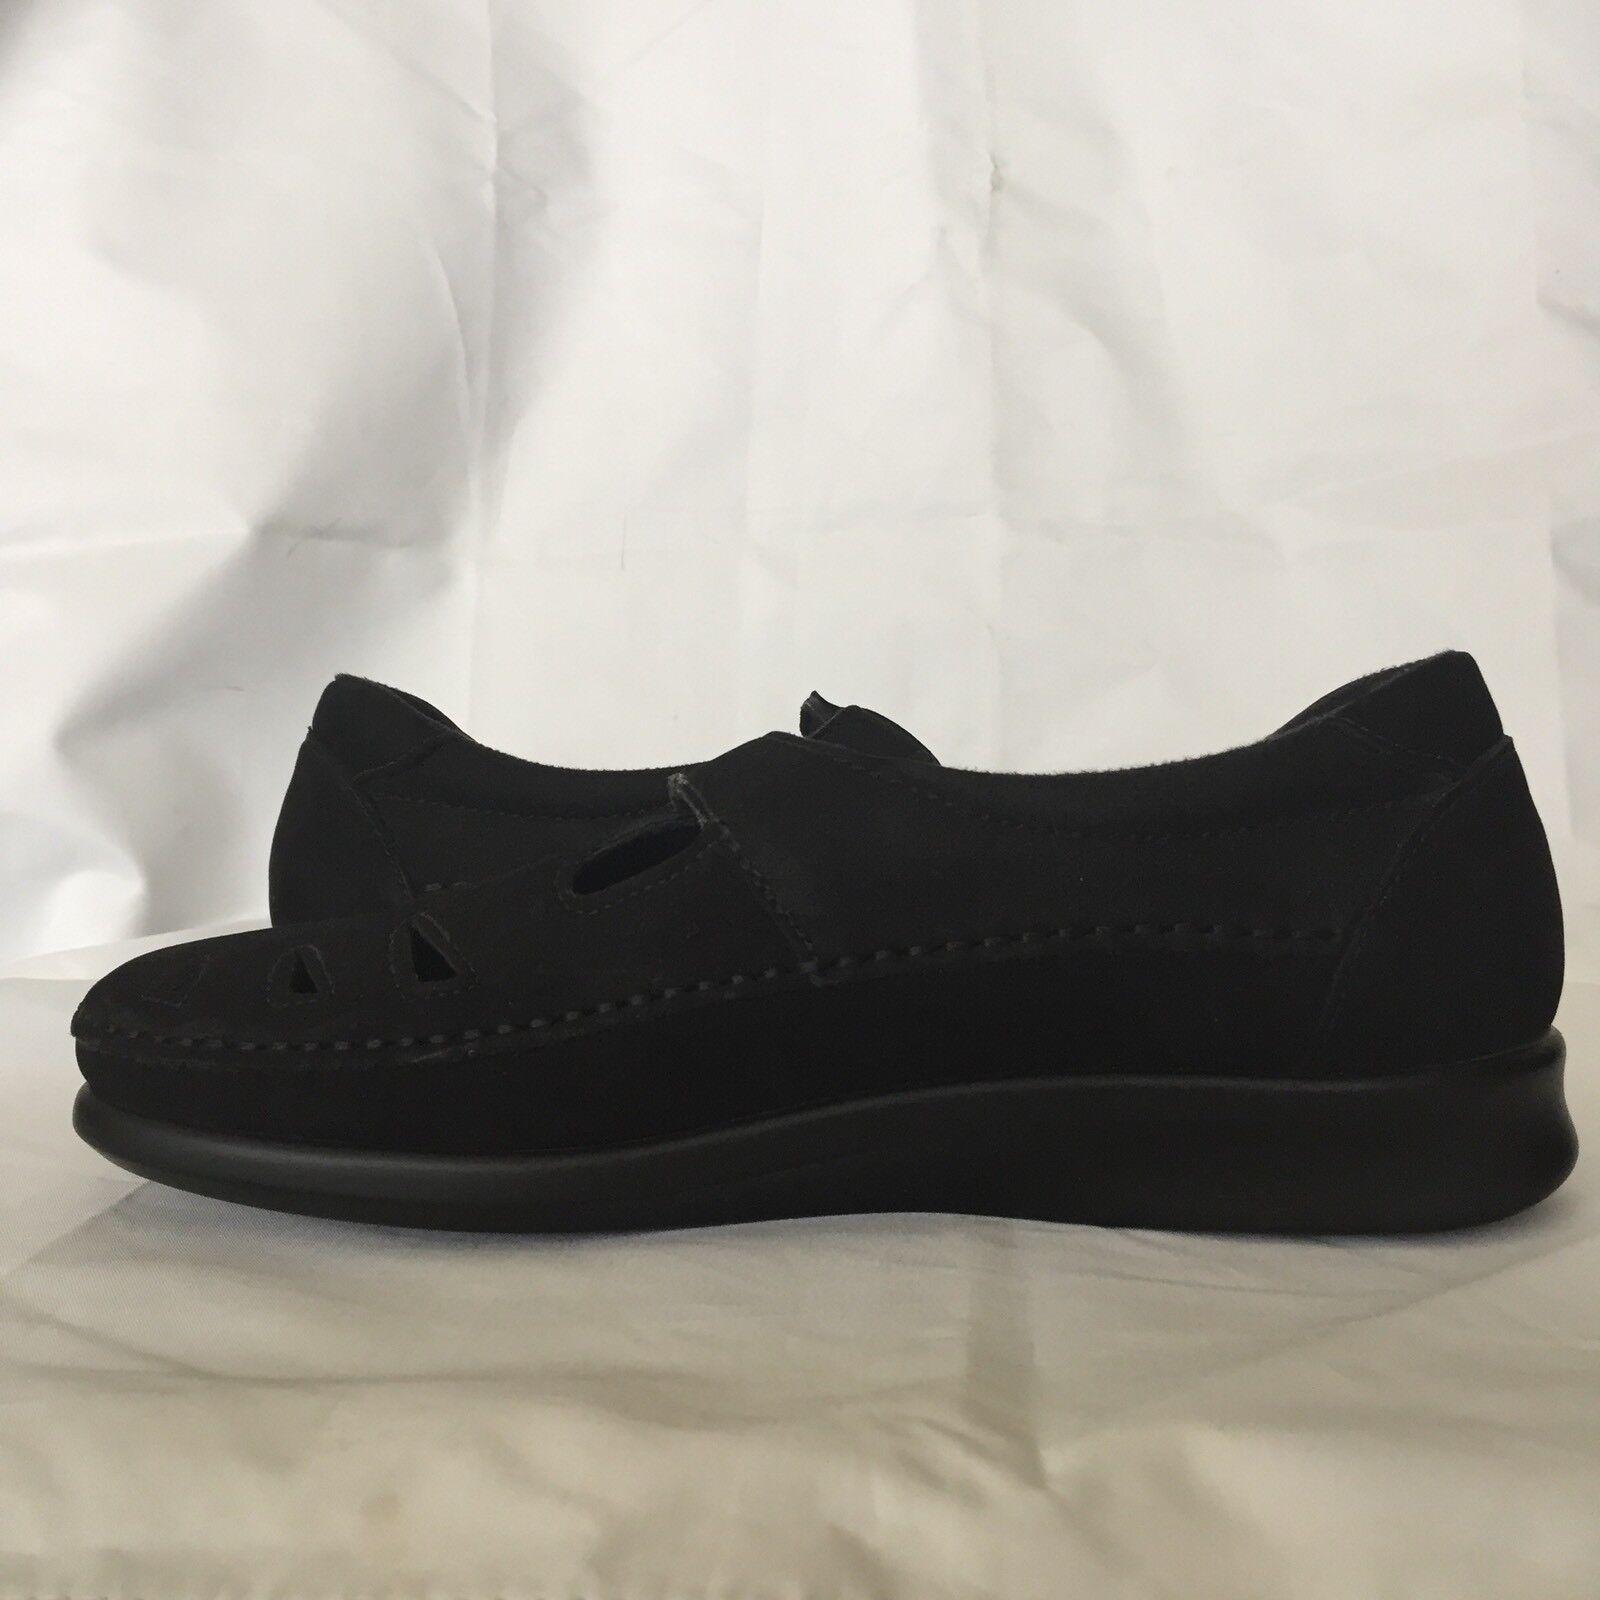 SAS Women's Size 7.5 N Roamer Charcoal Charcoal Charcoal Black Leather Moccasin Tripad Comfort 981f61